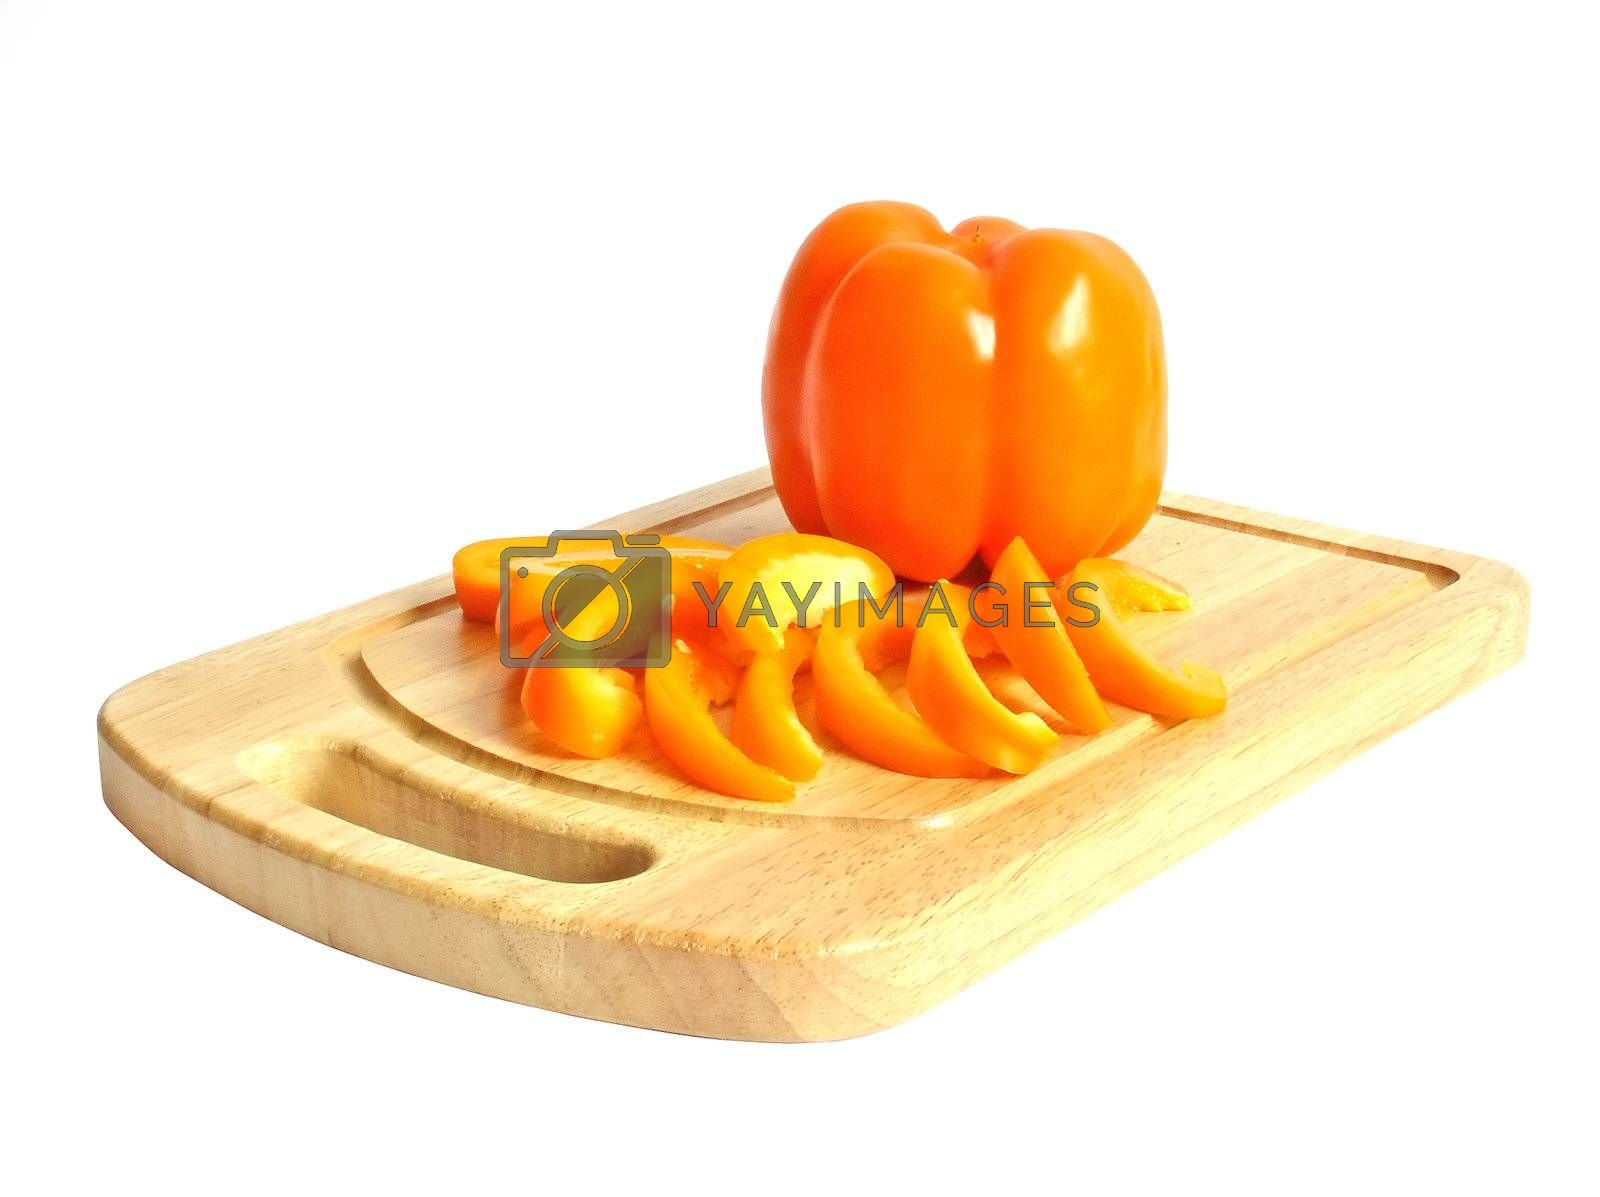 Royalty free image of paprika by kapp